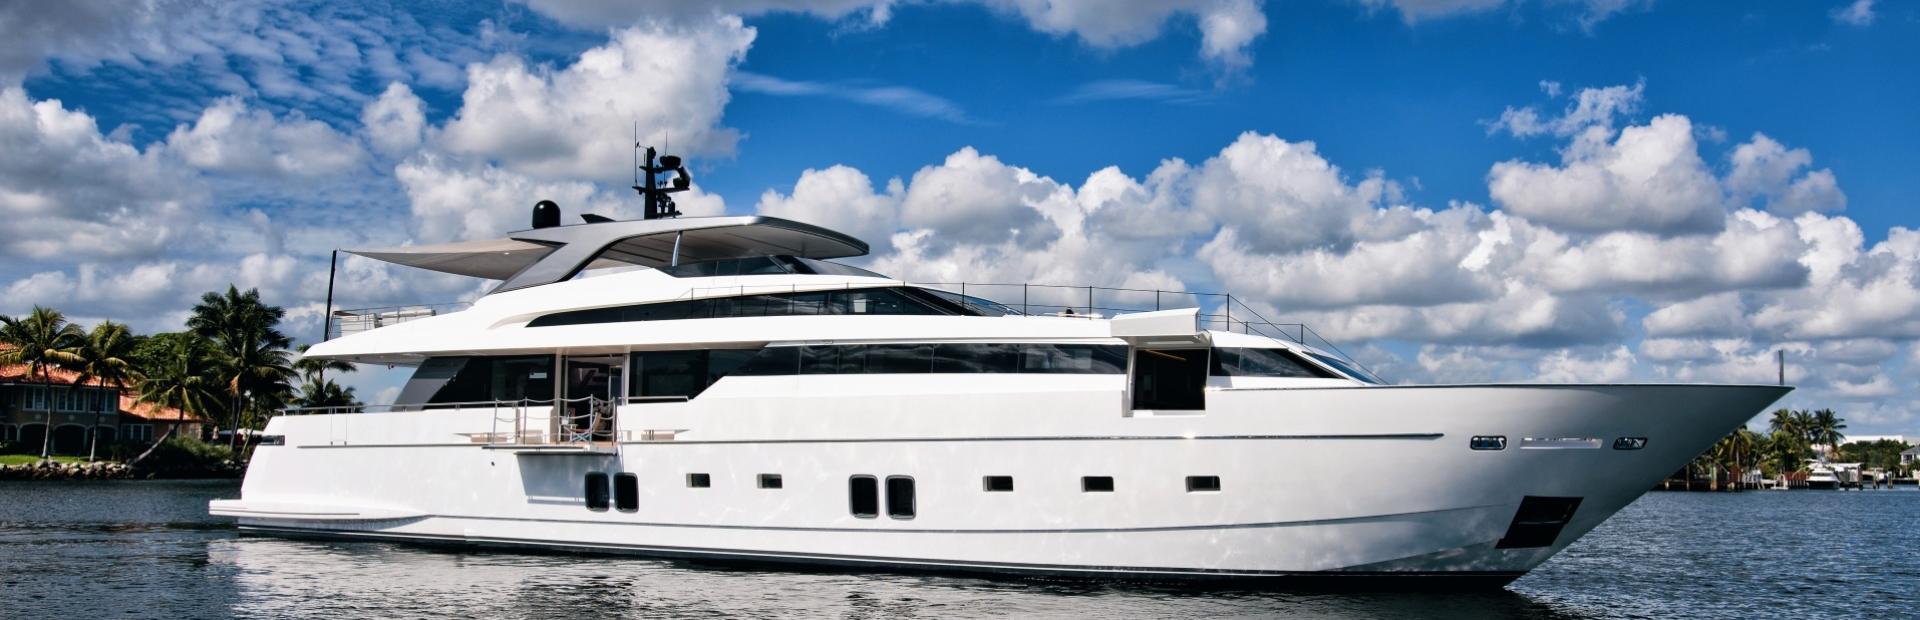 SL118 Yacht Charter